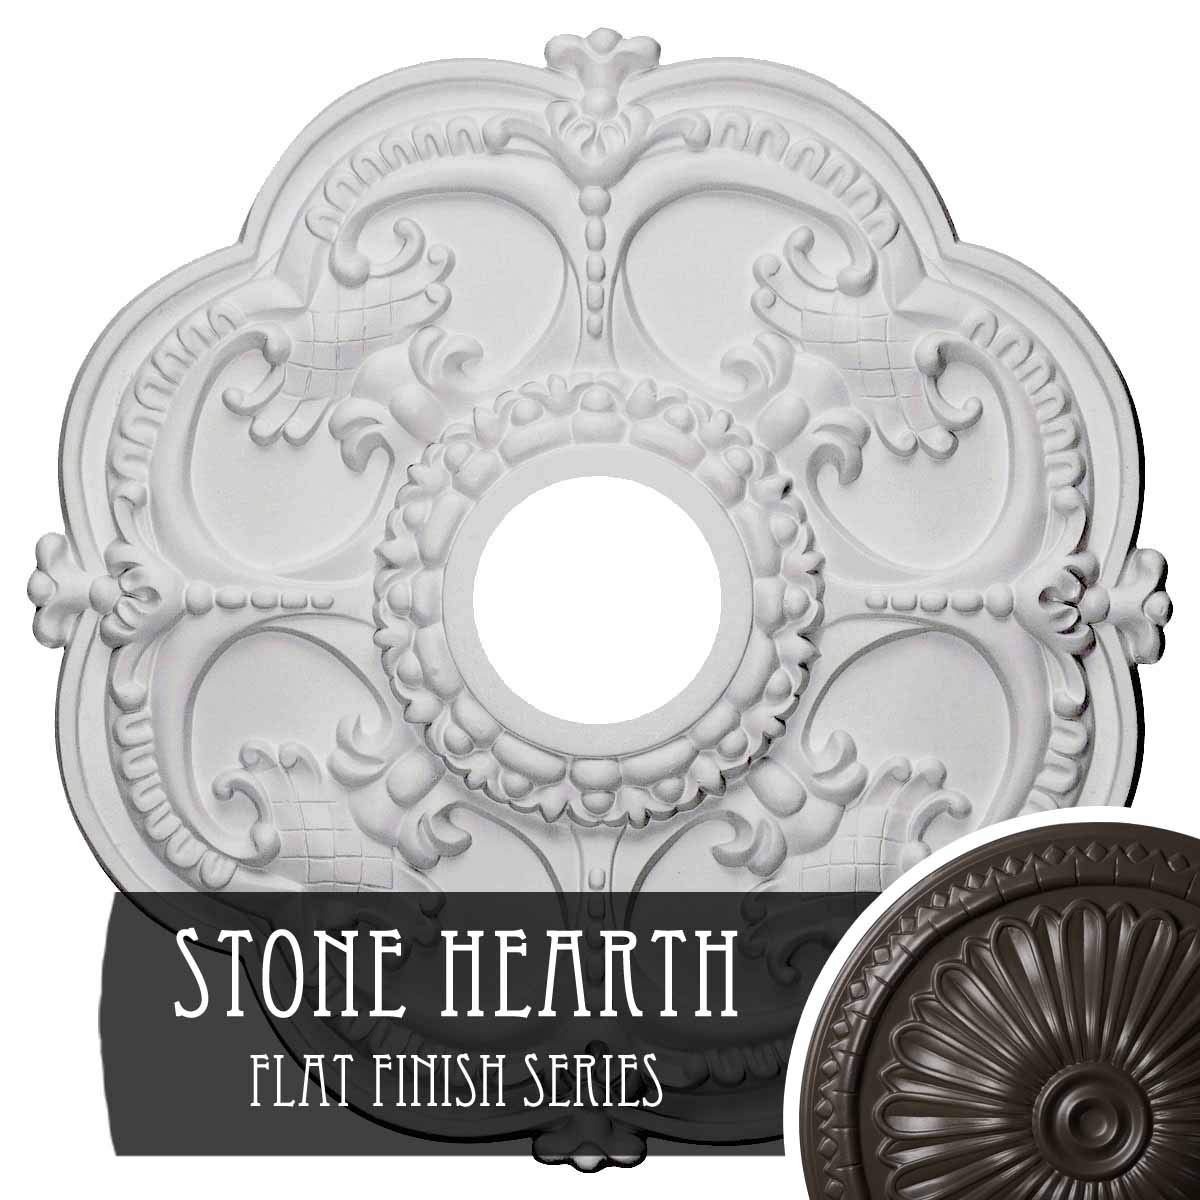 Stone Hearth Ekena Millwork CM17ROUWF redherham Ceiling Medallion, 18 OD x 3 1 2 ID x 1 1 2 P, Ultra Pure White